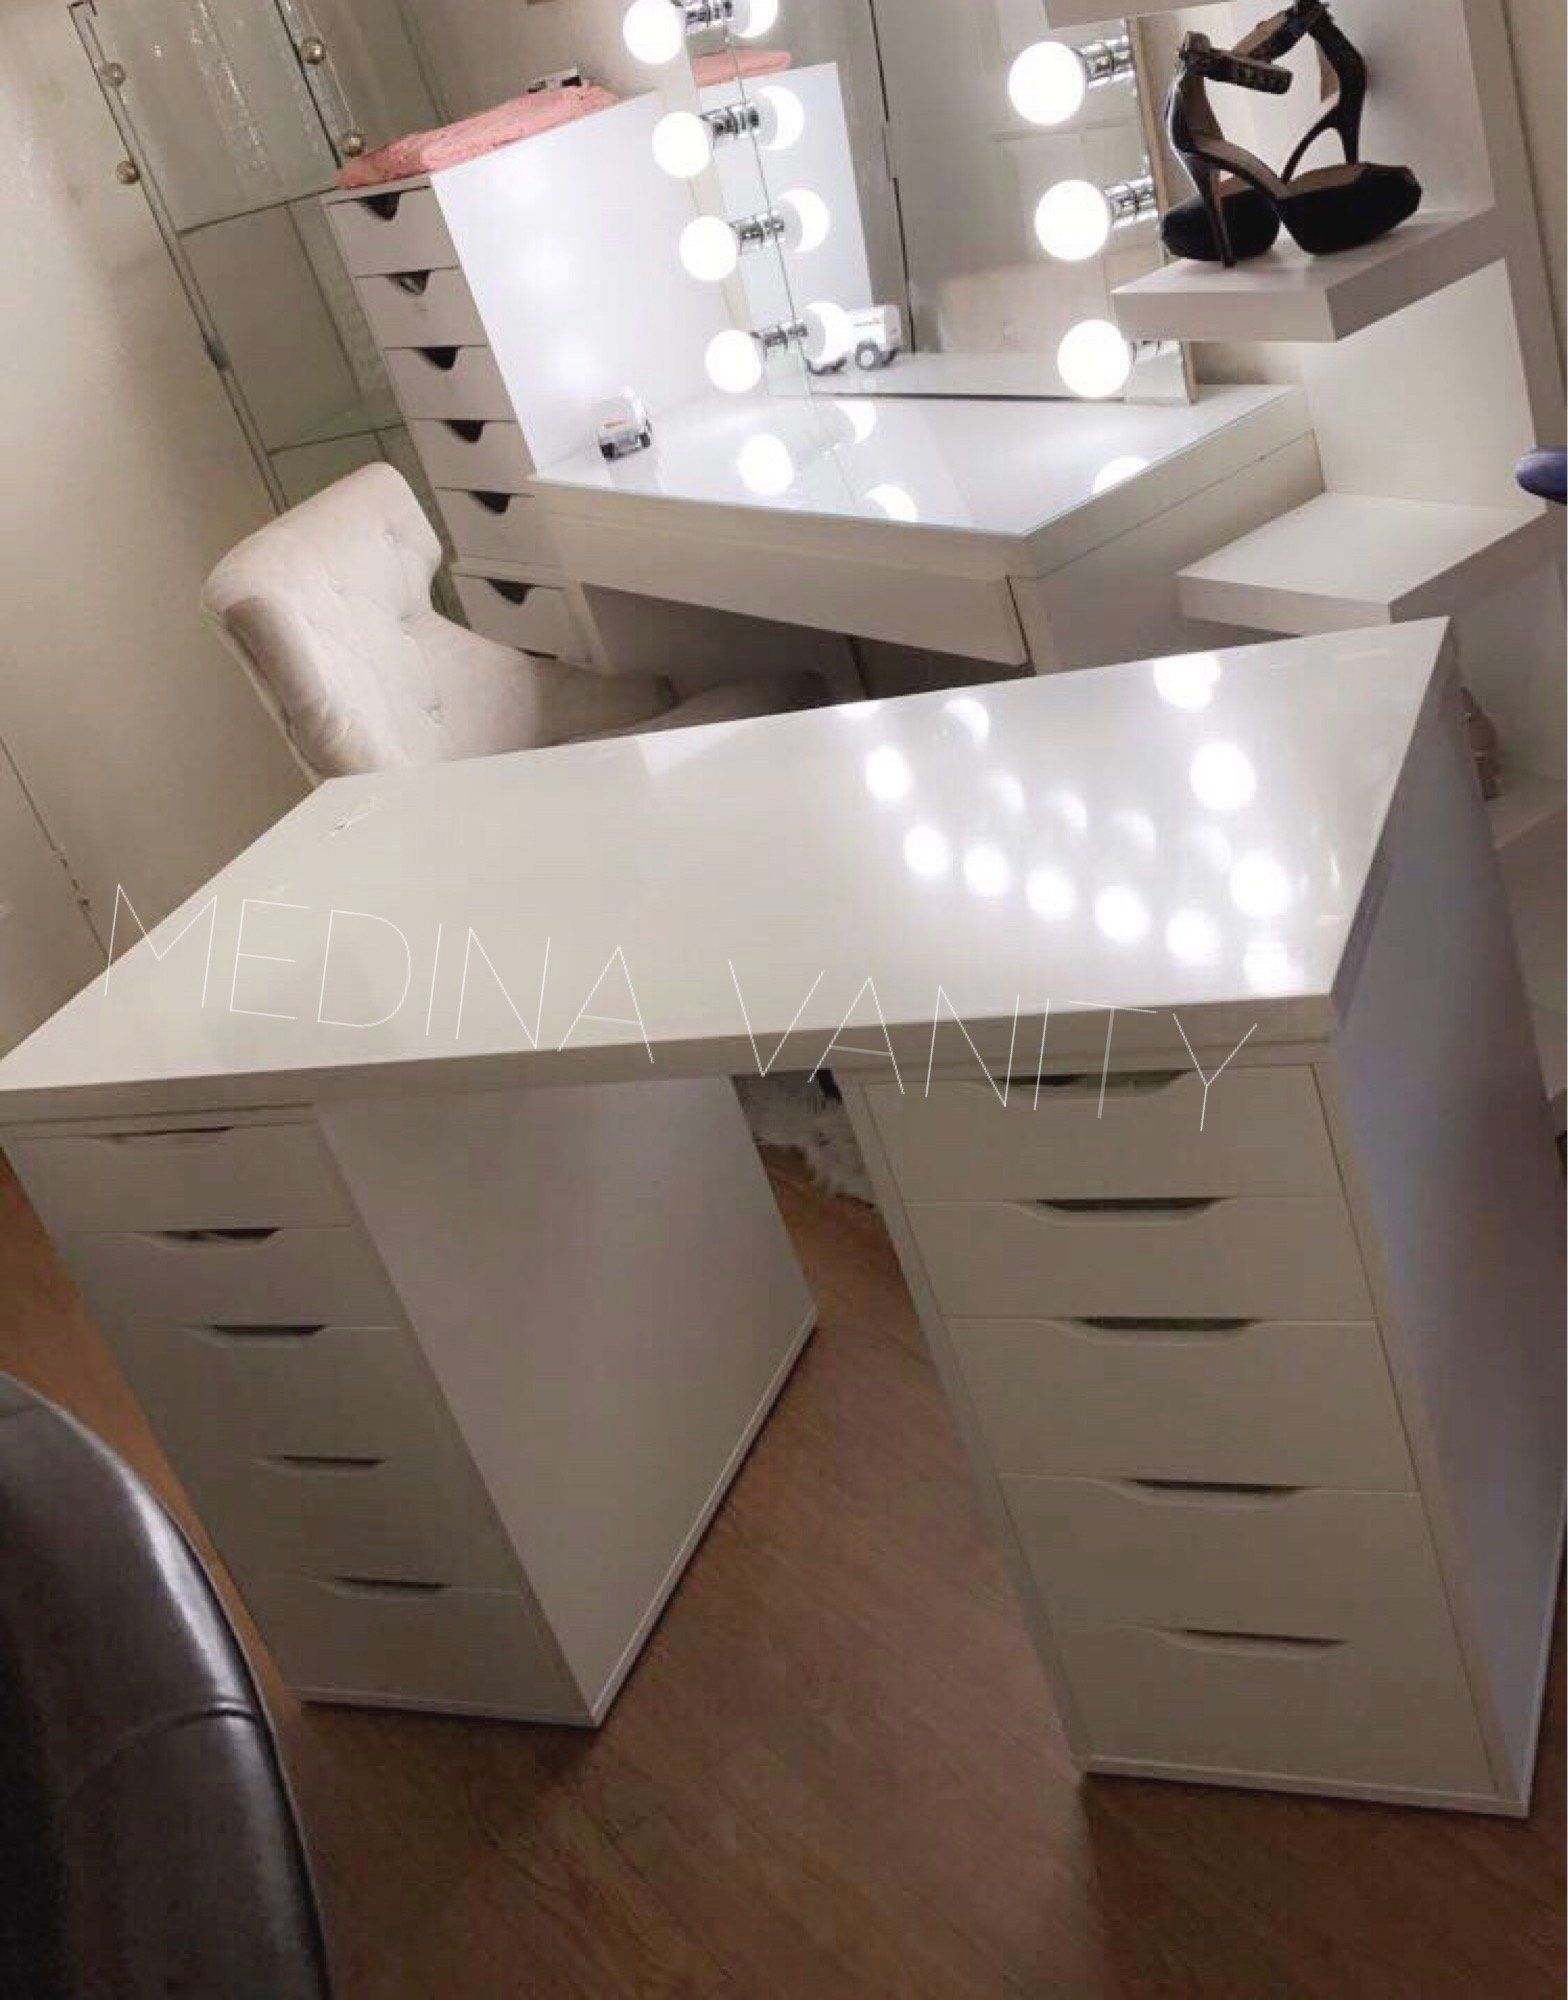 Vanity Table with two 5 drawer dressers Medina Vanity